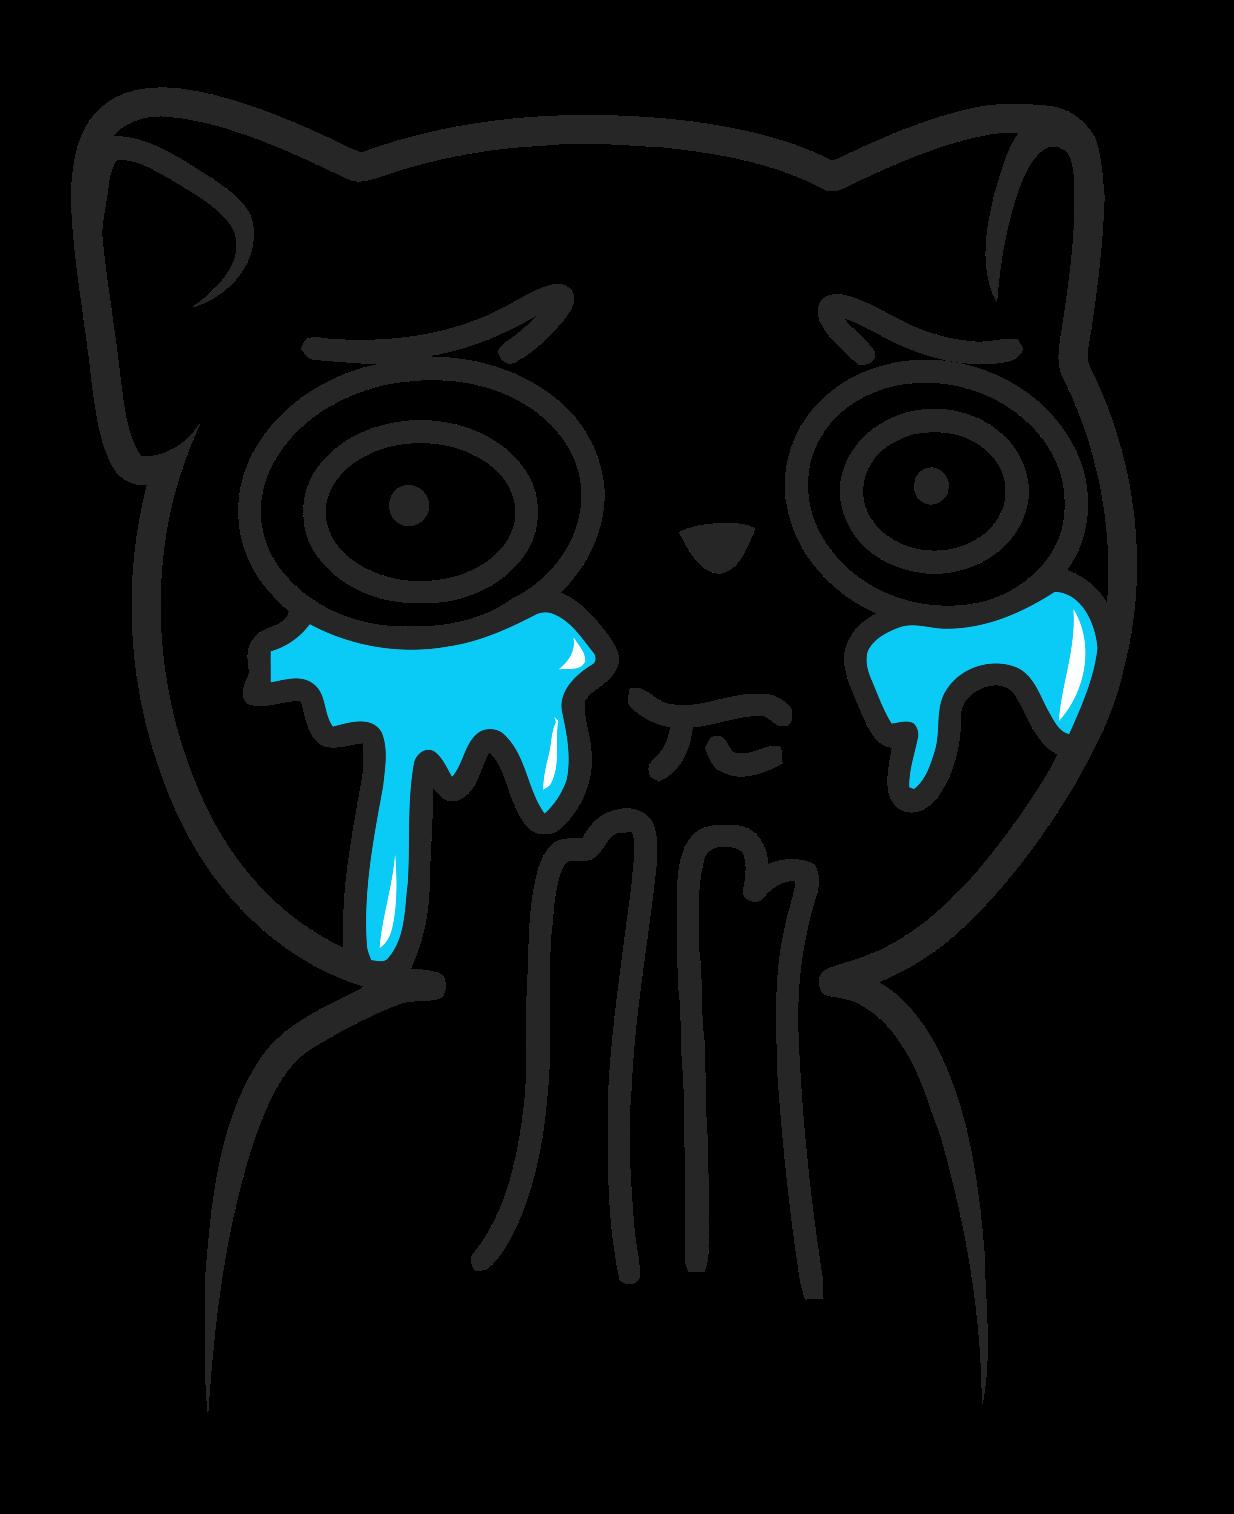 73c6faeac32700f4699f76a99f152e89 cat overload internet faces pinterest meme faces, rage faces